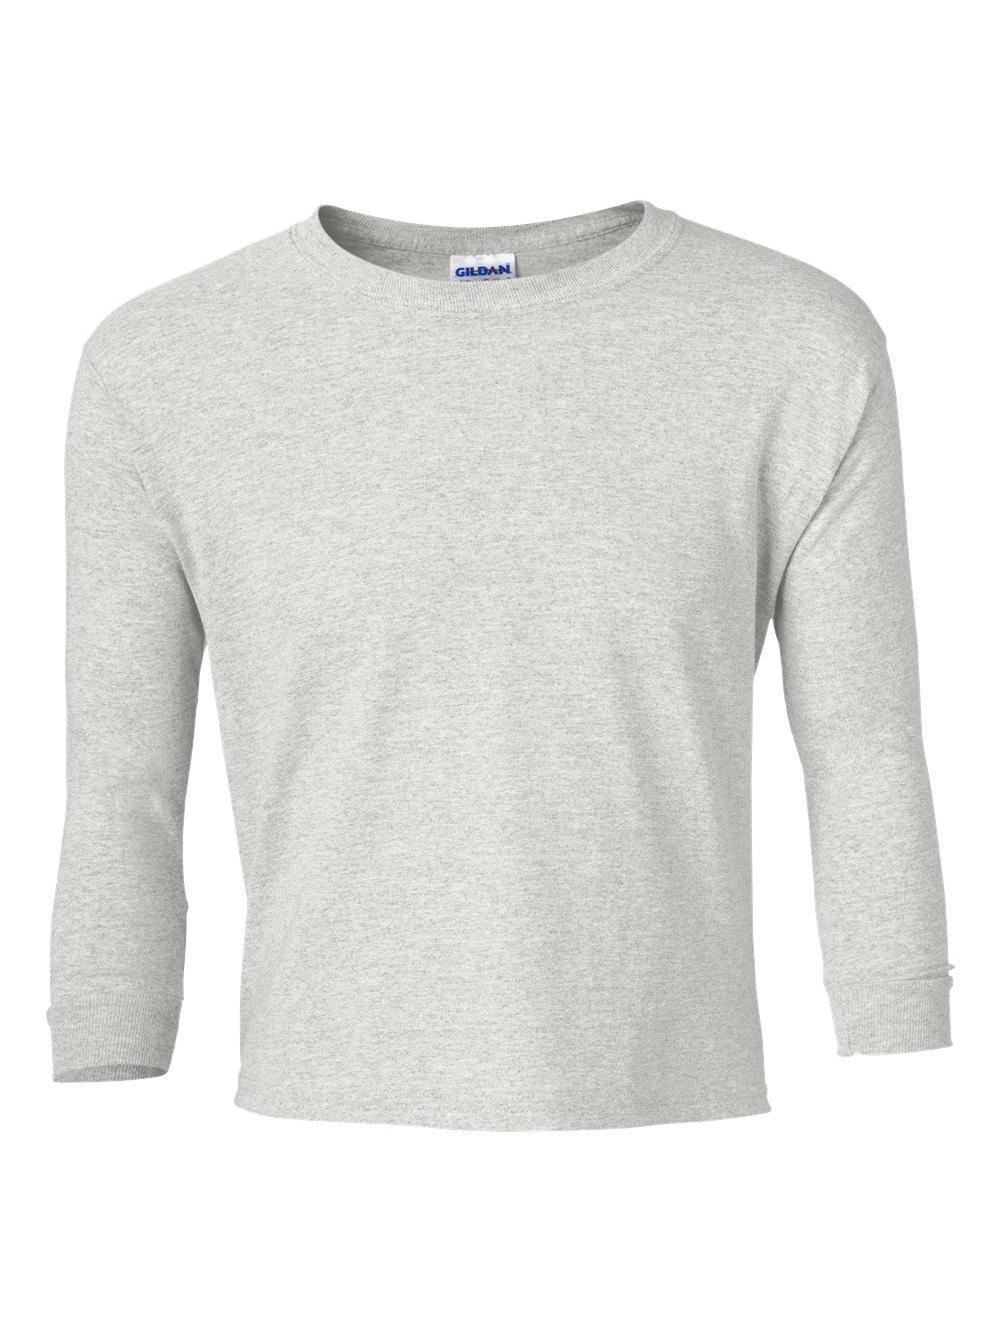 Gildan-Ultra-Cotton-Youth-Long-Sleeve-T-Shirt-2400B thumbnail 3